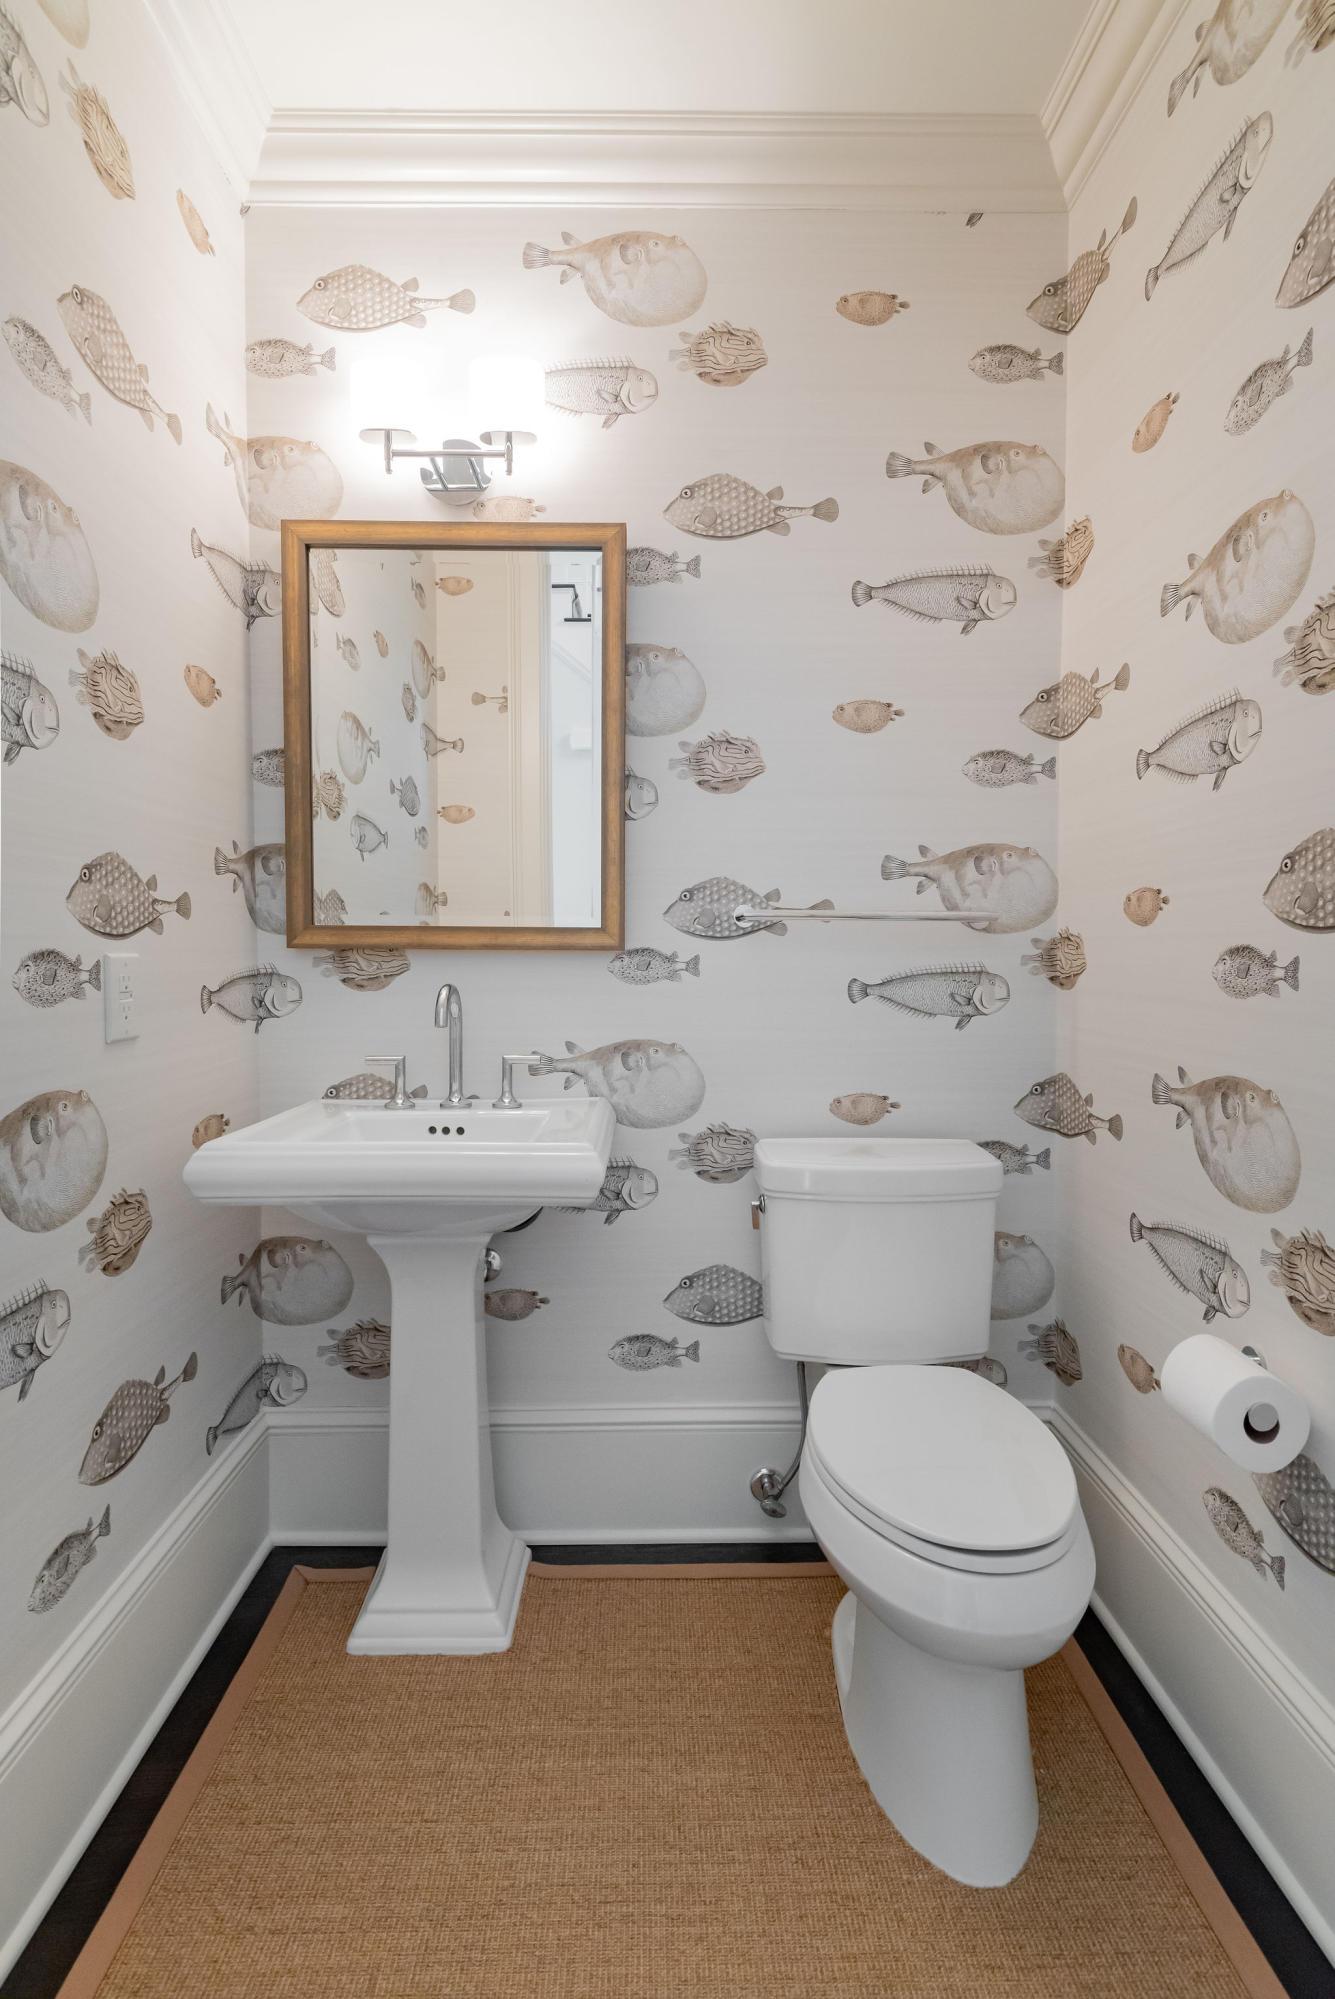 Kiawah Island Homes For Sale - 3 Grey Widgeon, Kiawah Island, SC - 23